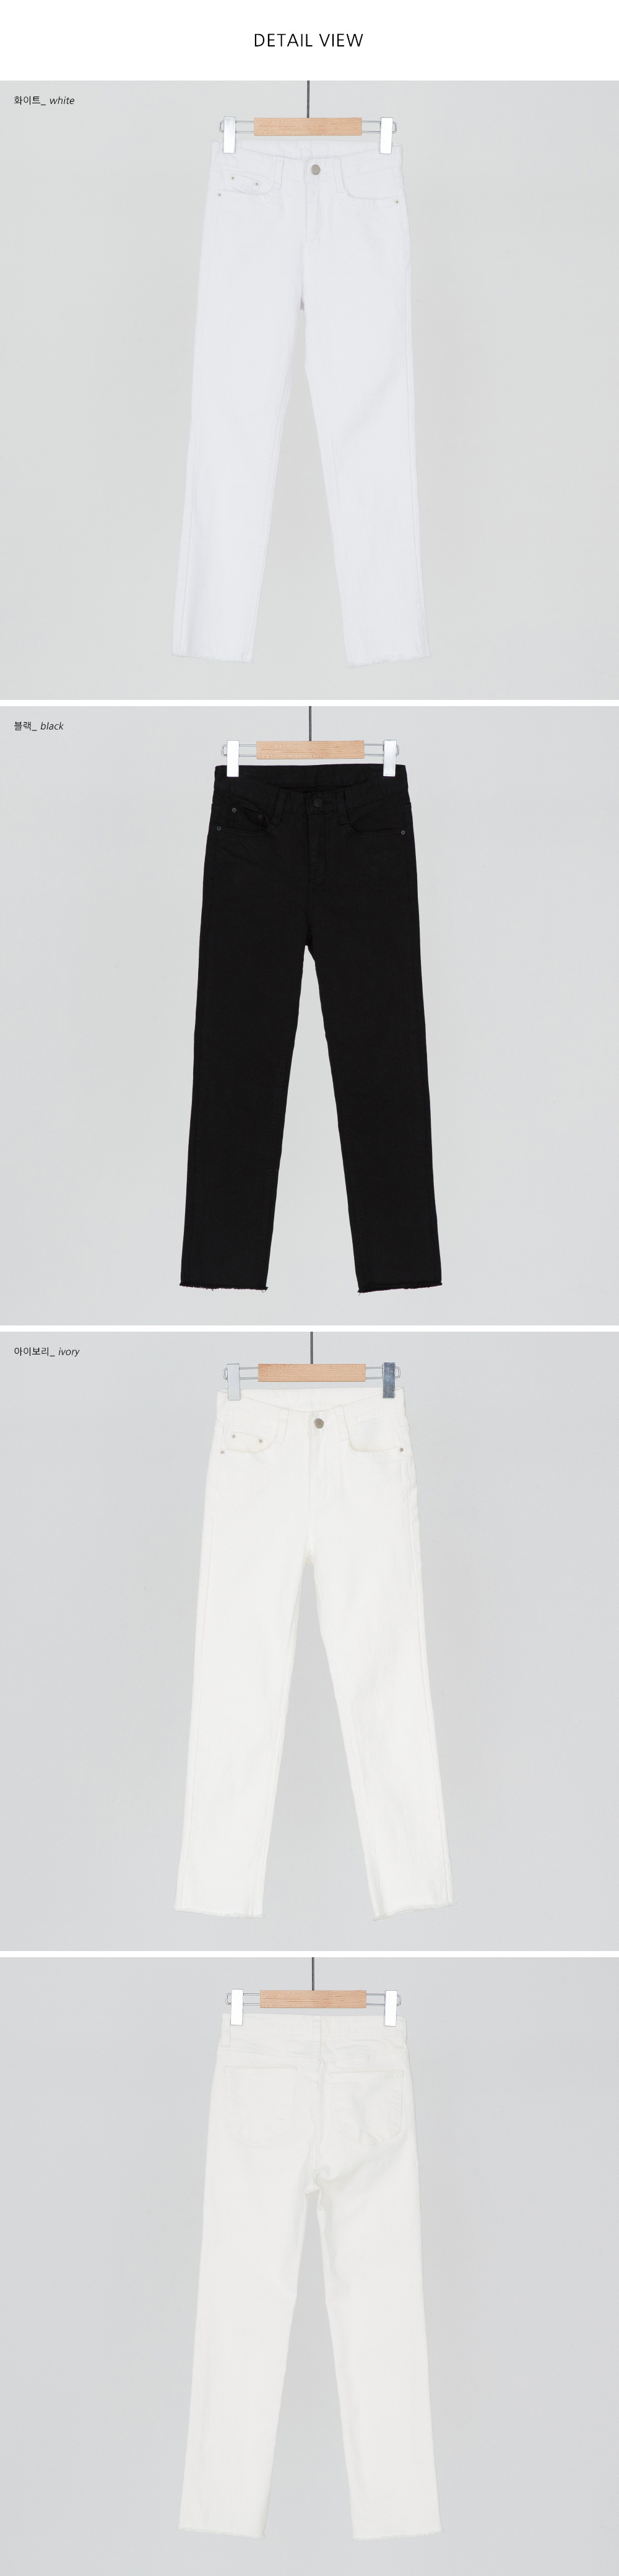 Hem cutting slim span 9 cotton pants